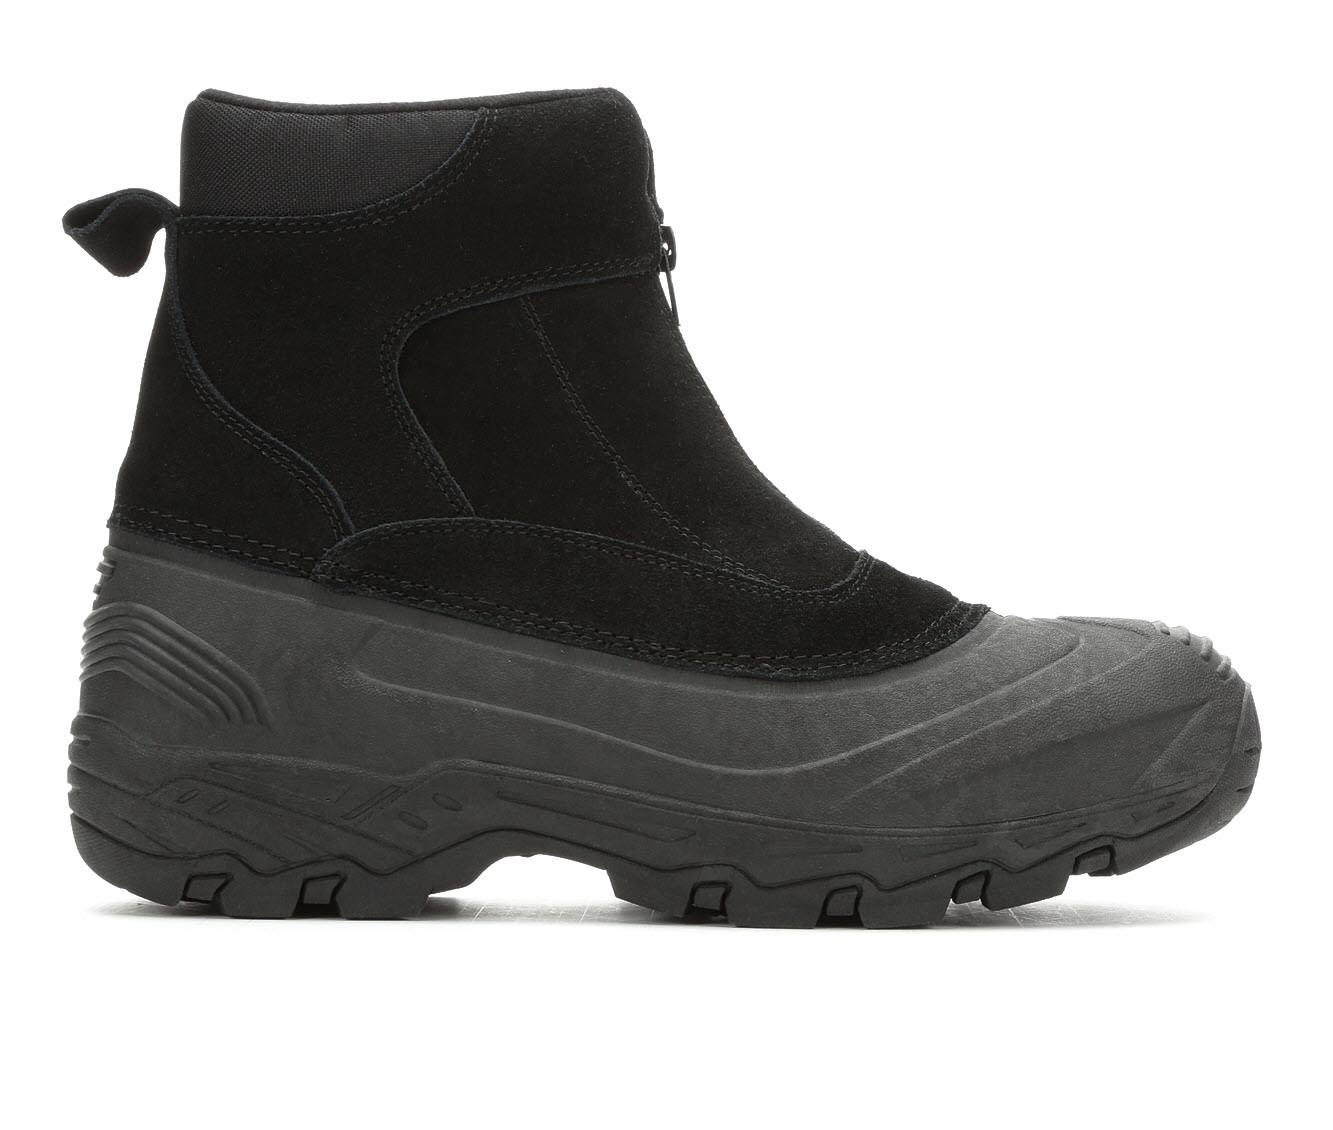 London Fog Holborn Men's Boots (Black Faux Leather)